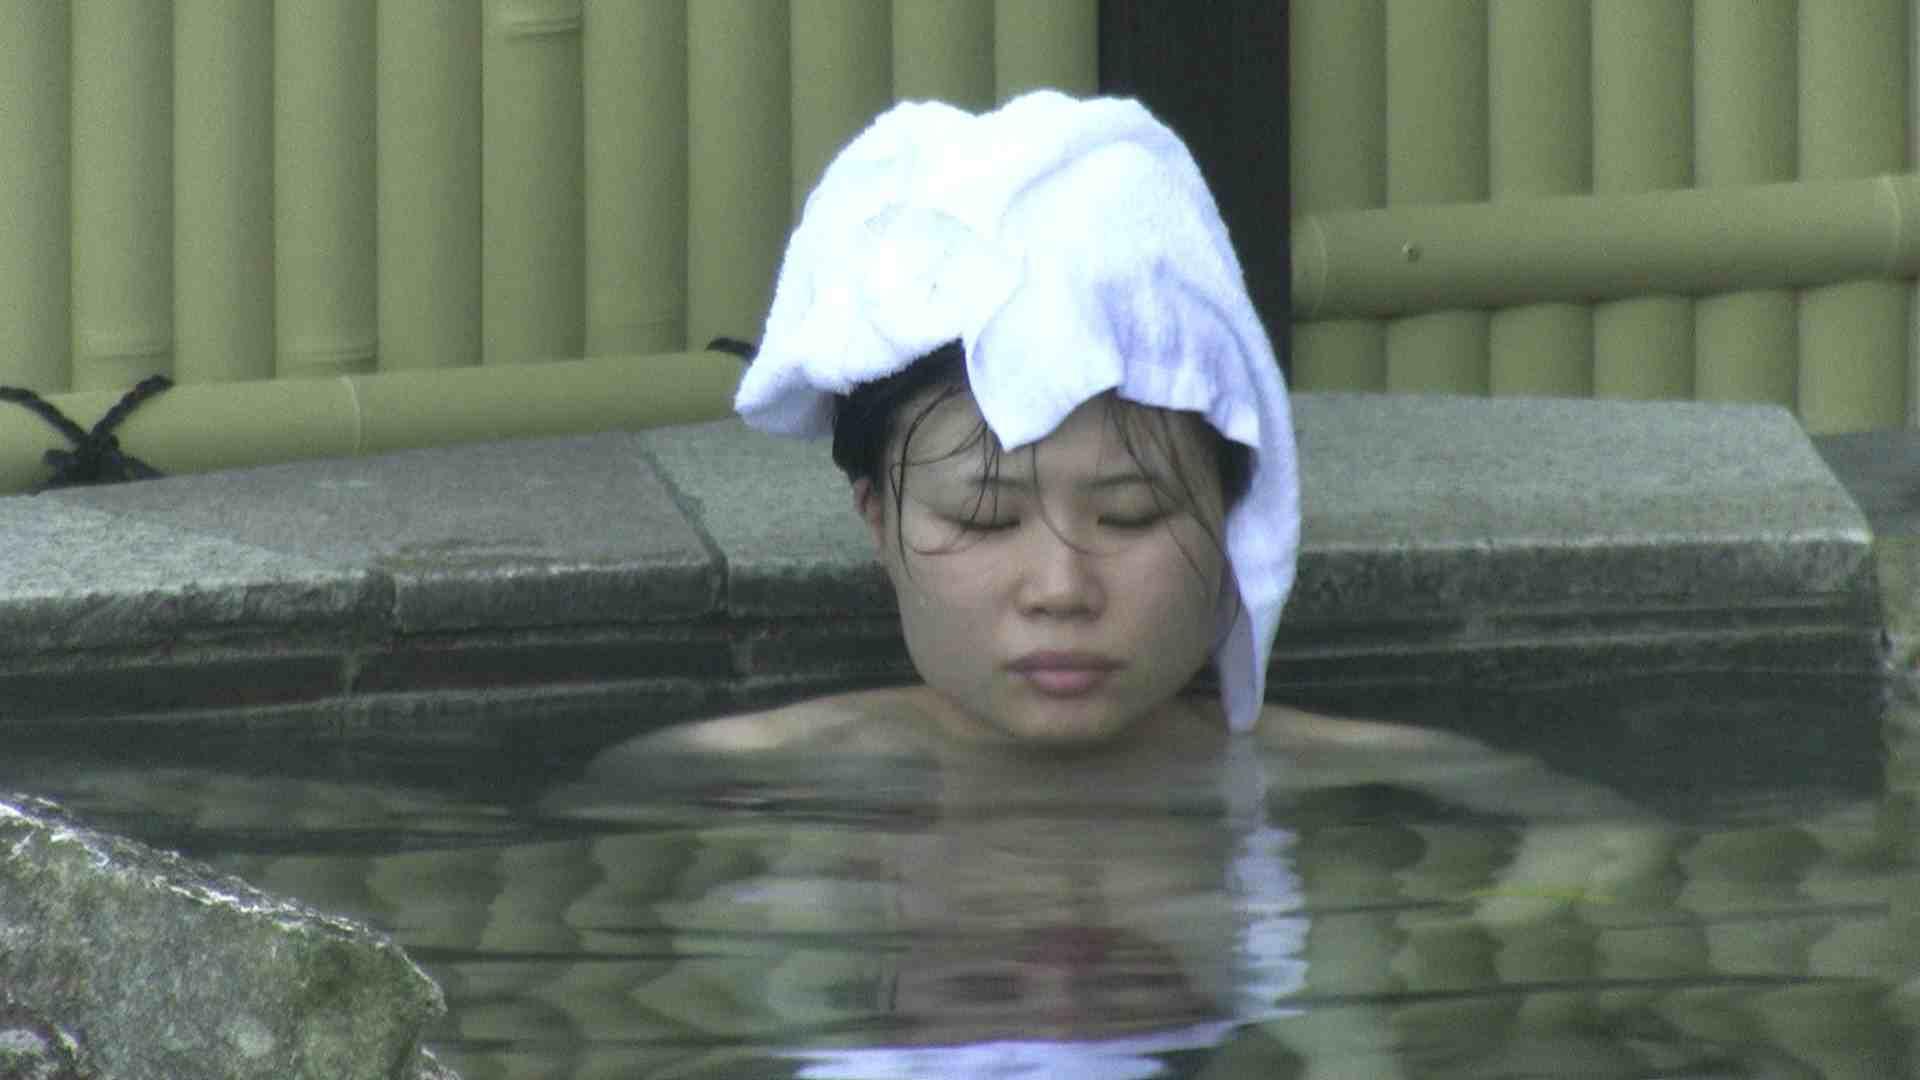 Aquaな露天風呂Vol.183 露天風呂編 | 盗撮シリーズ  104PIX 85